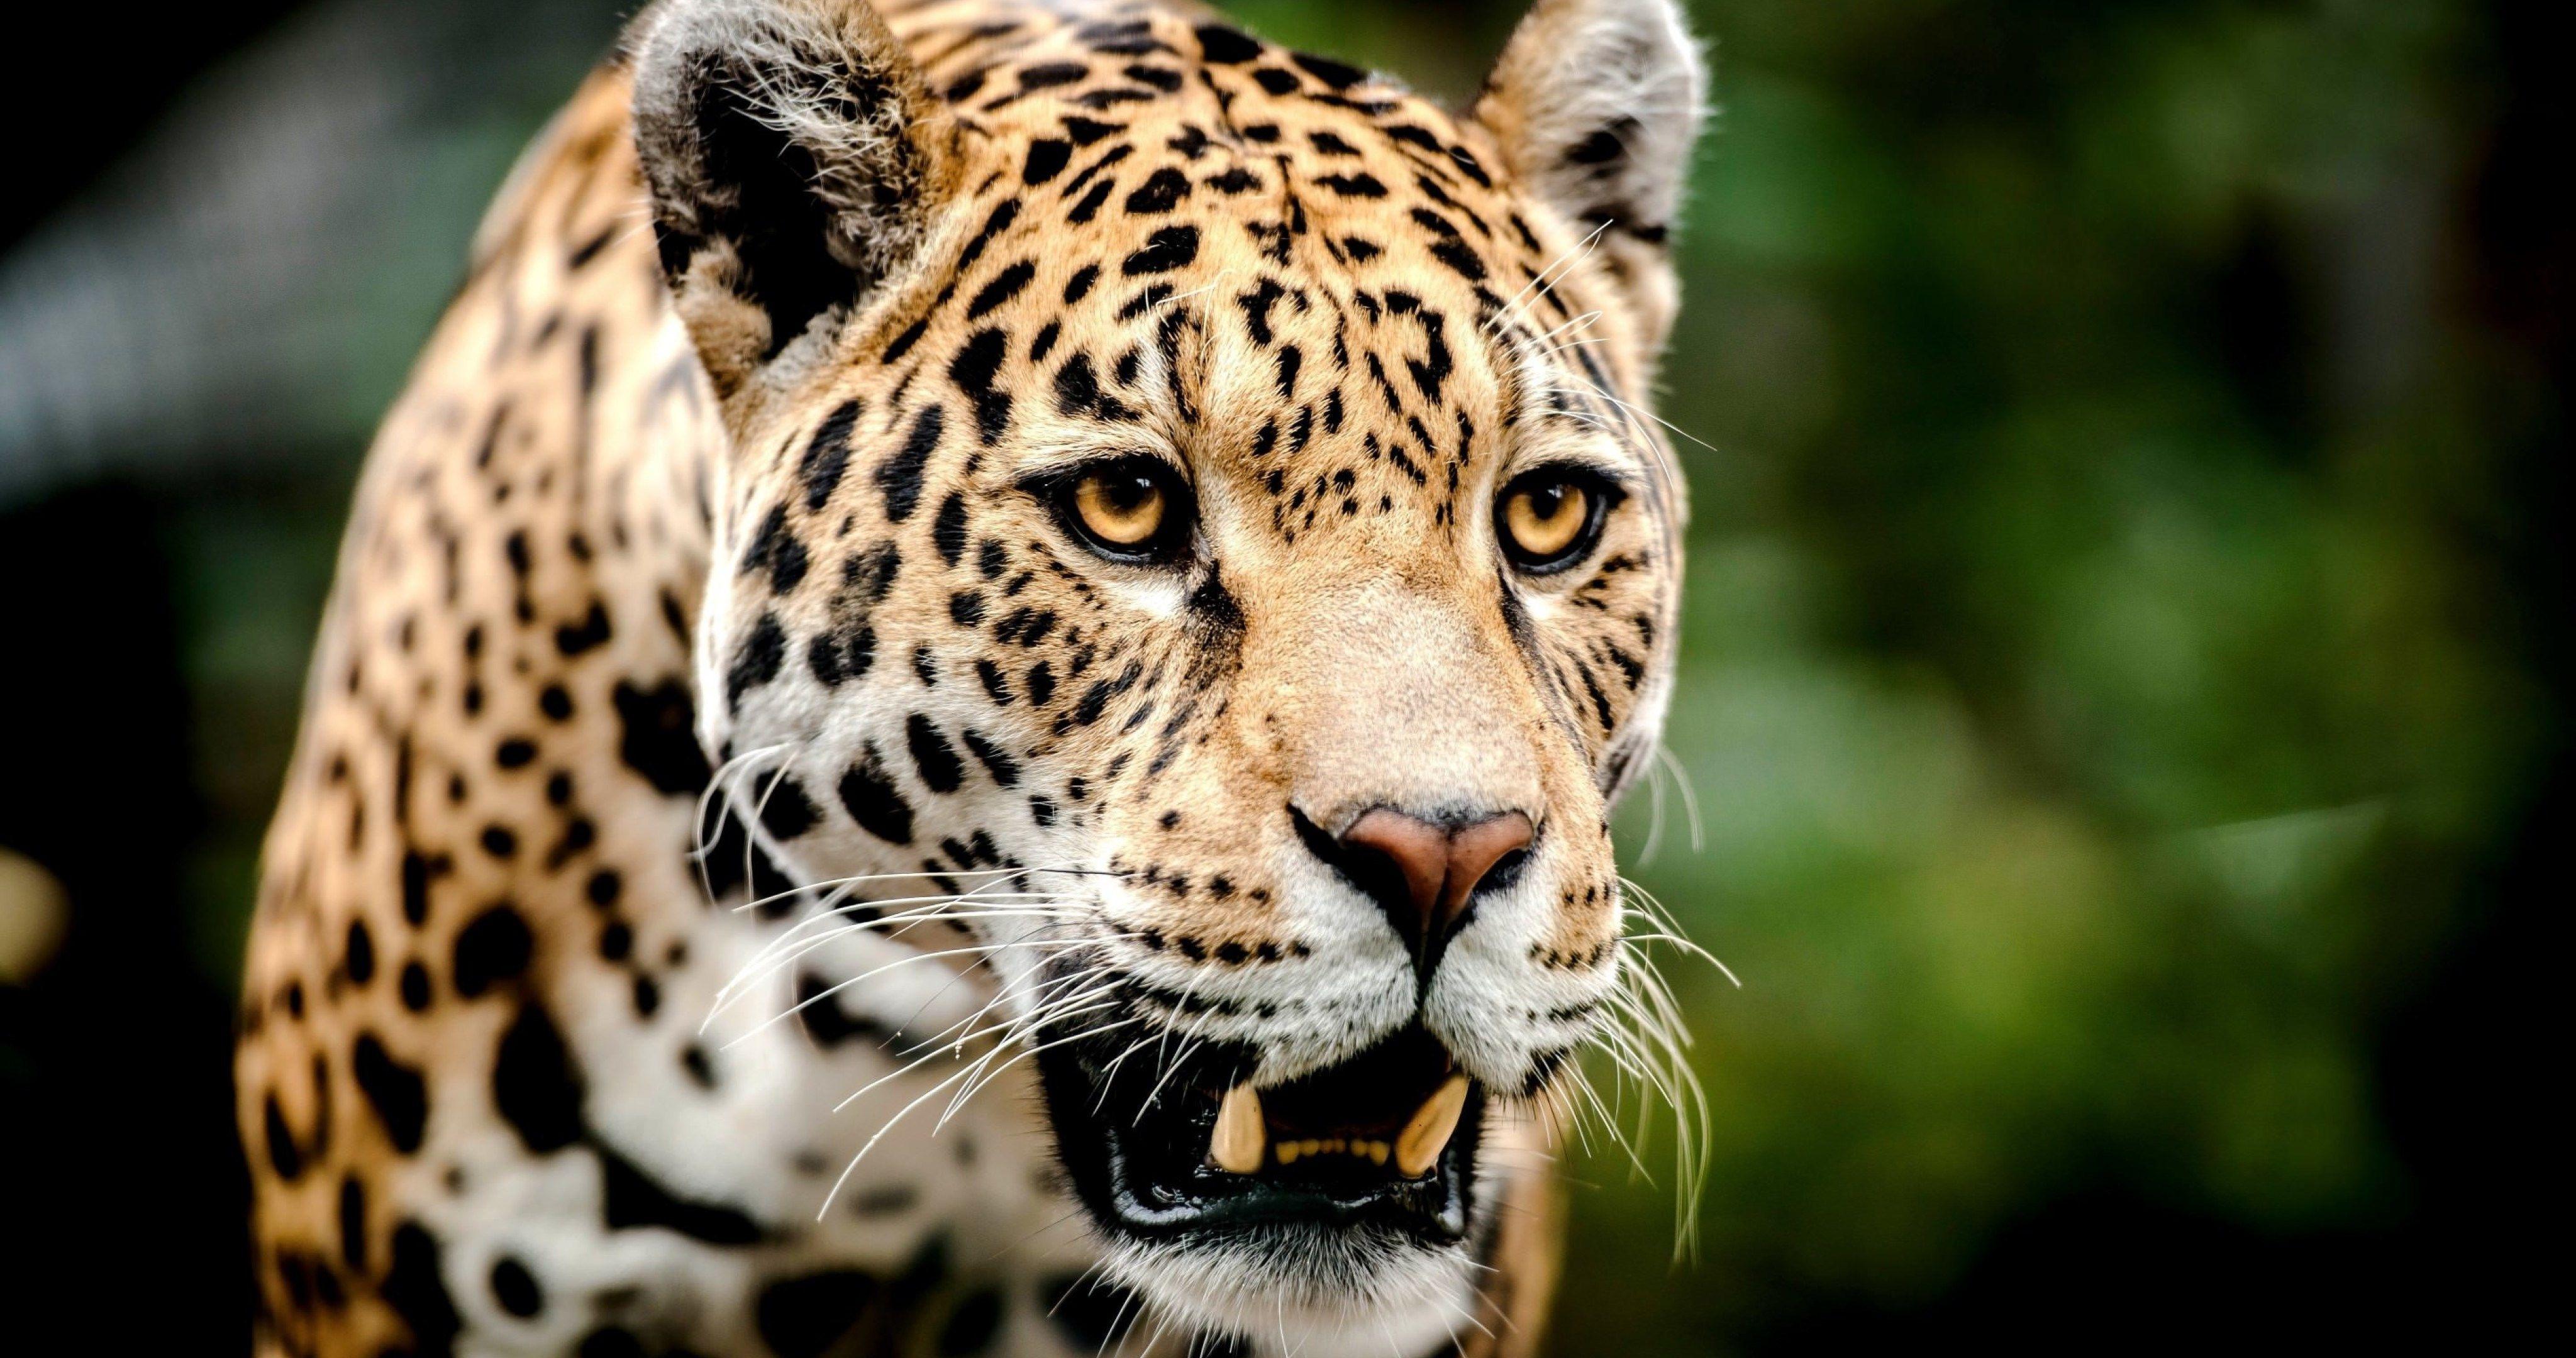 big cat face 4k ultra hd wallpaper Jaguar animal